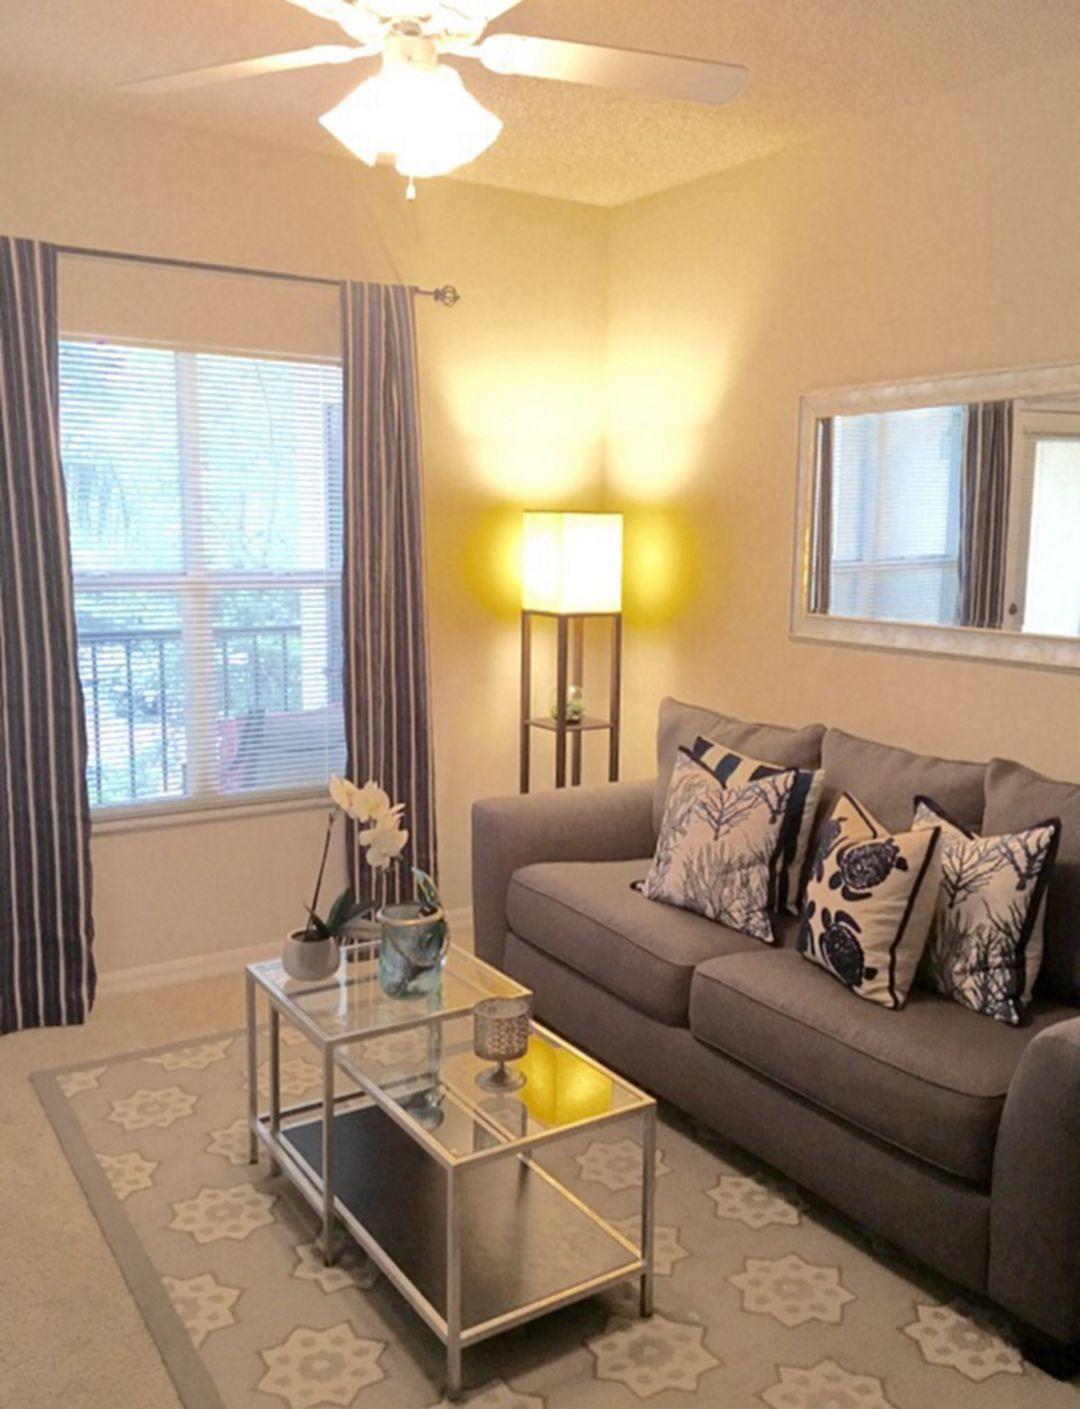 Apartment Living Room Decorating Idea New Awesome Apartment Living Room De In 2020 Small Apartment Living Room Living Room Decor Apartment Apartment Living Room Design